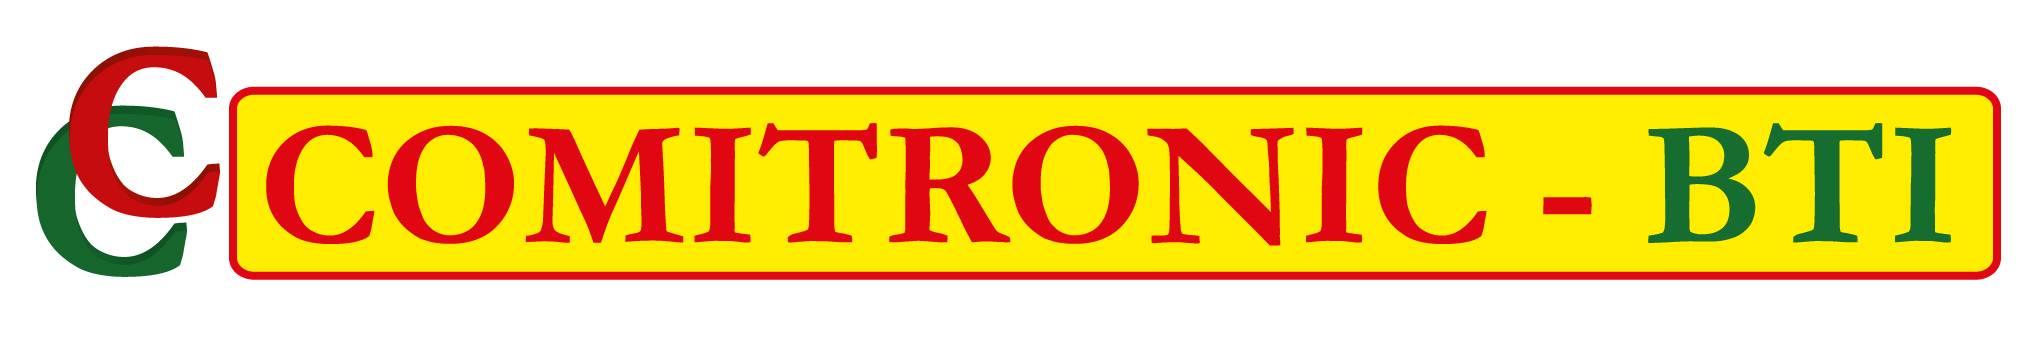 xComitronic-logo.jpg.pagespeed.ic.wBTMRB6AtE